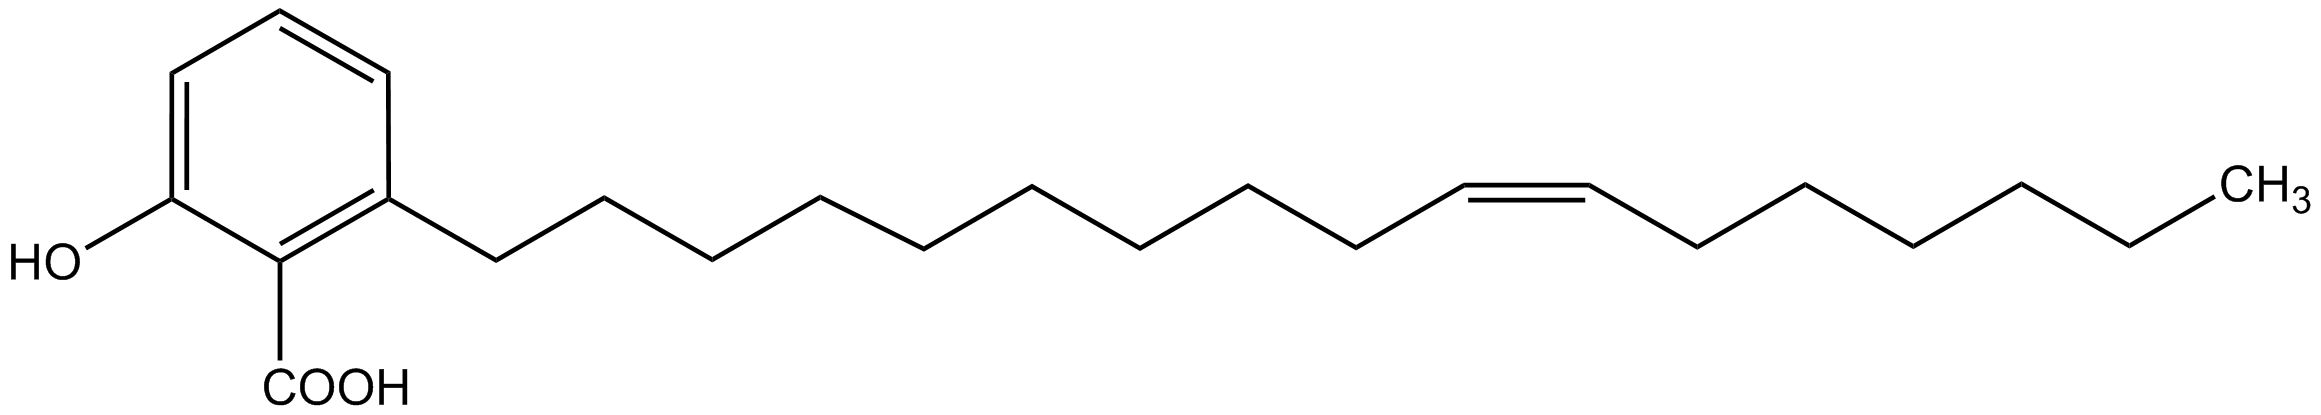 Ginkgolic acid C17:1 phyproof® Reference Substance   PhytoLab